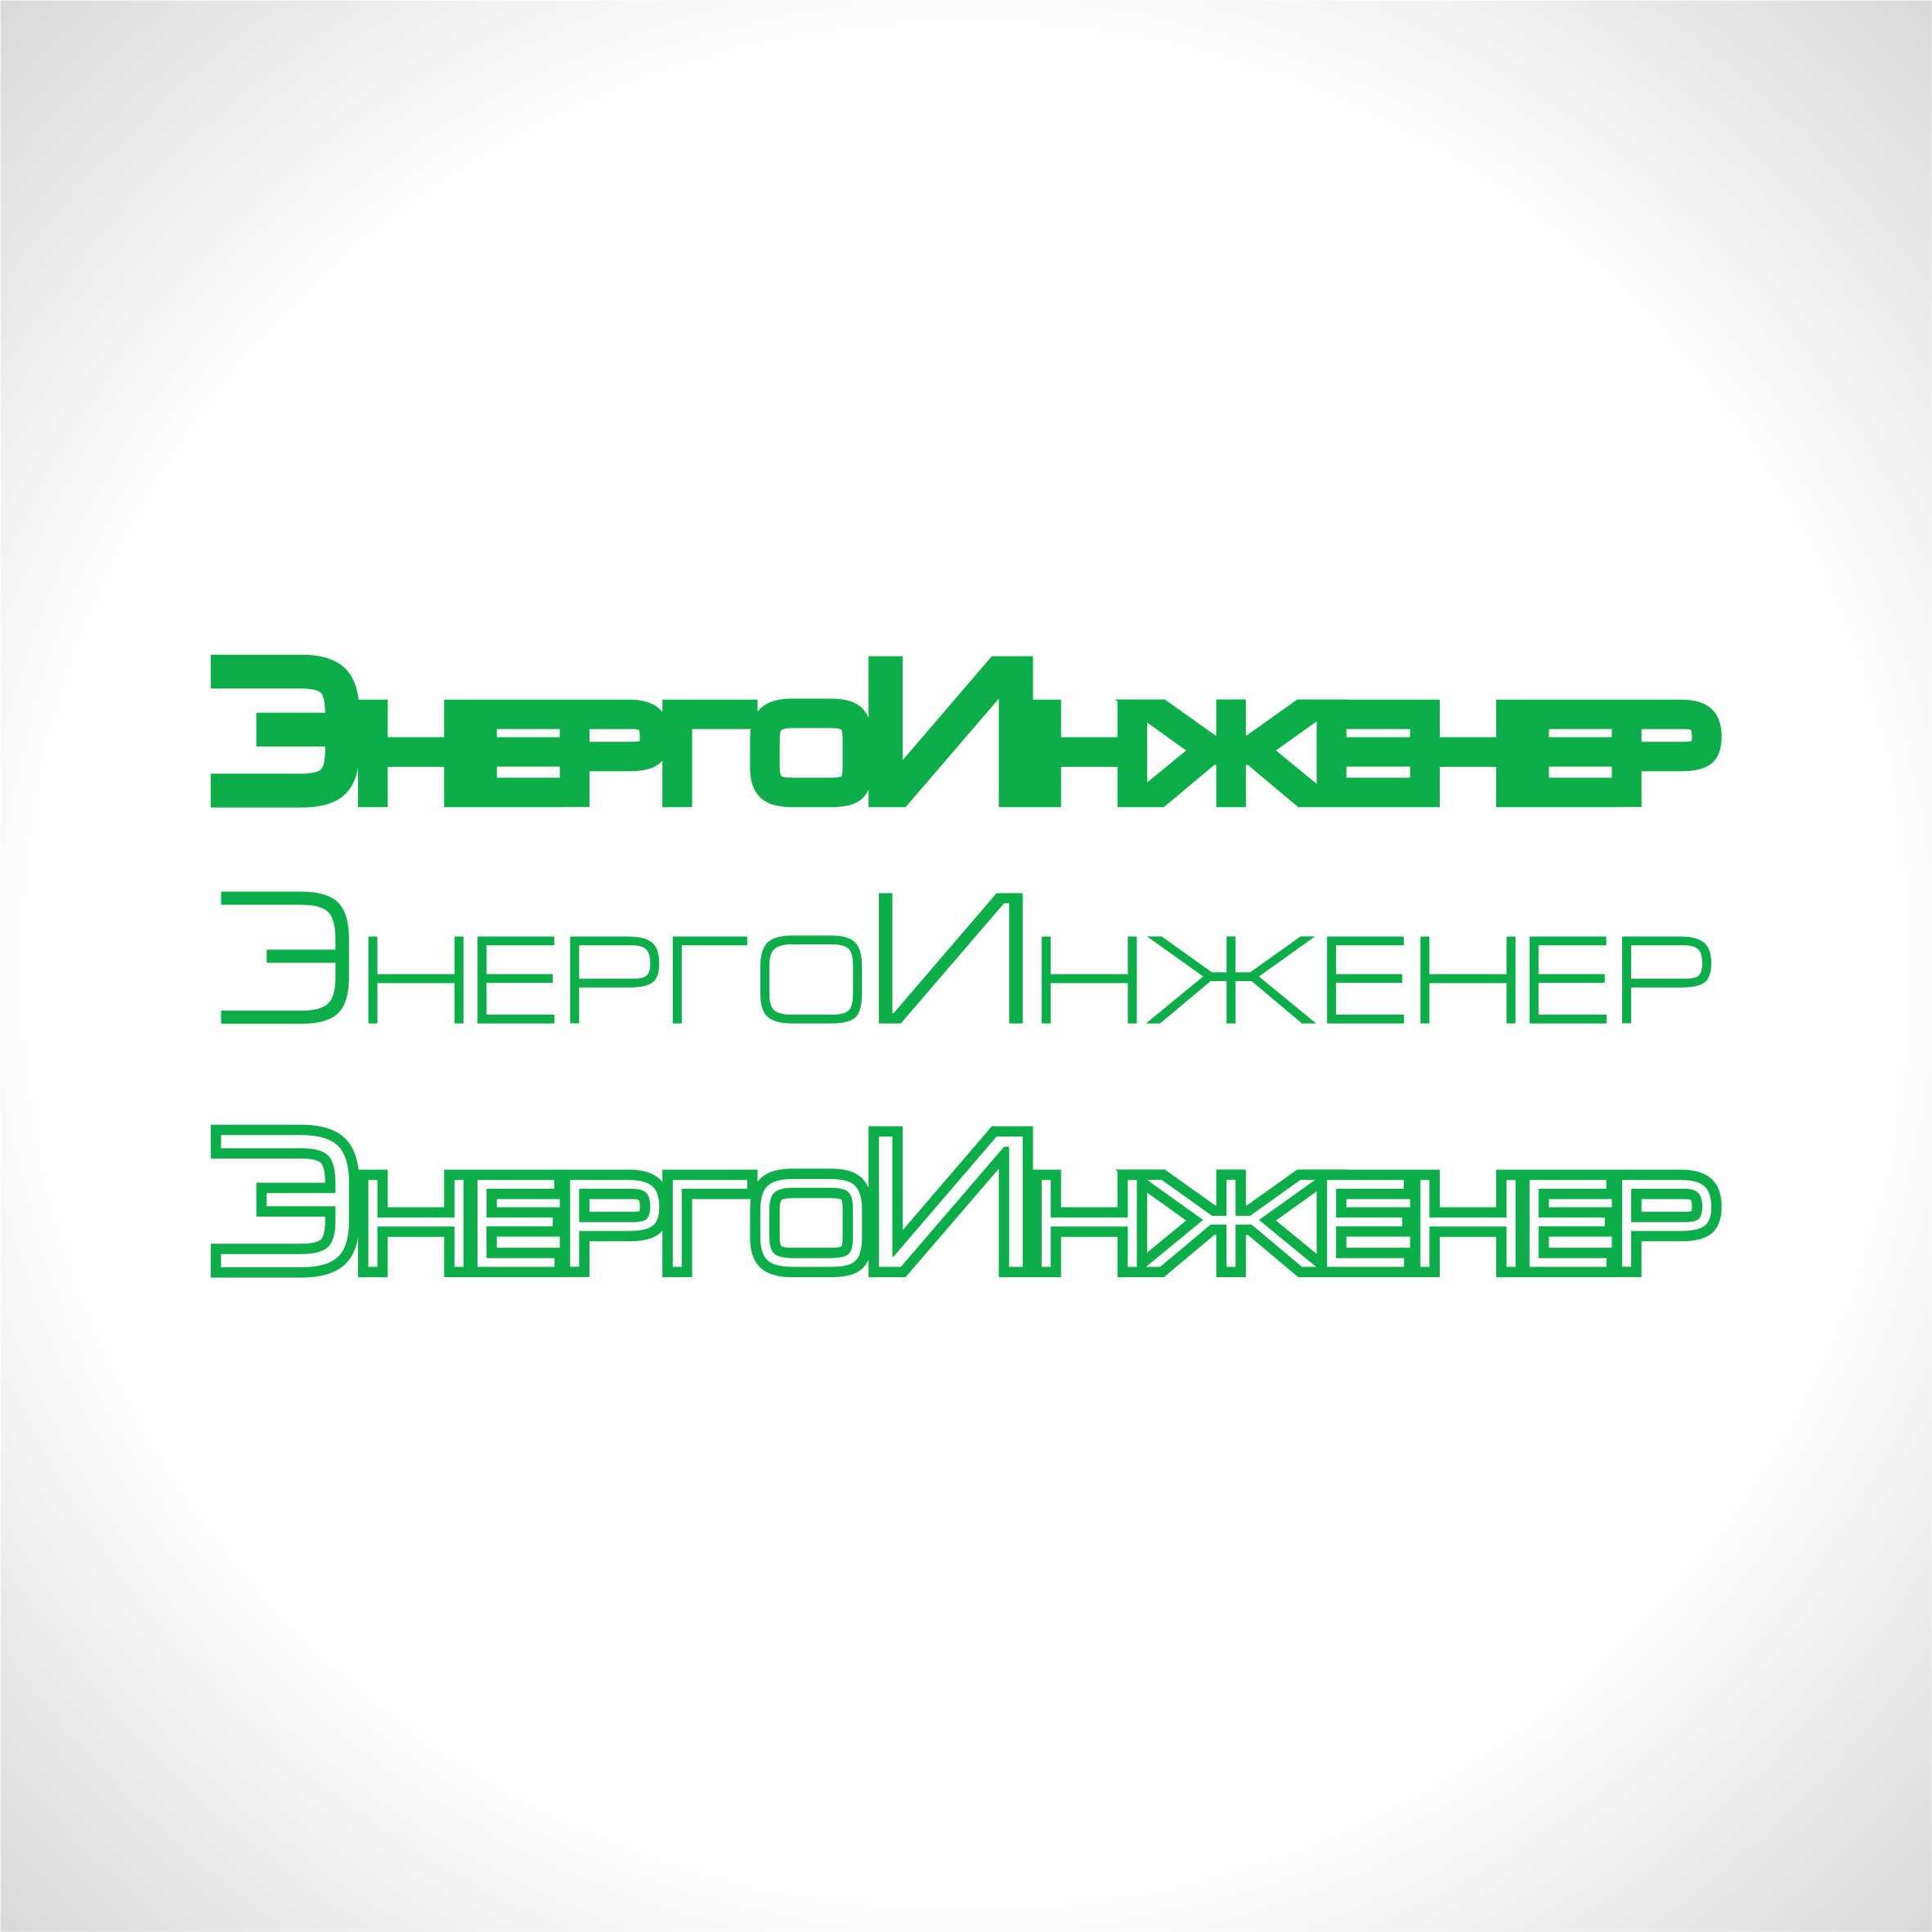 Логотип для инженерной компании фото f_30751c91f3f2e17a.jpg